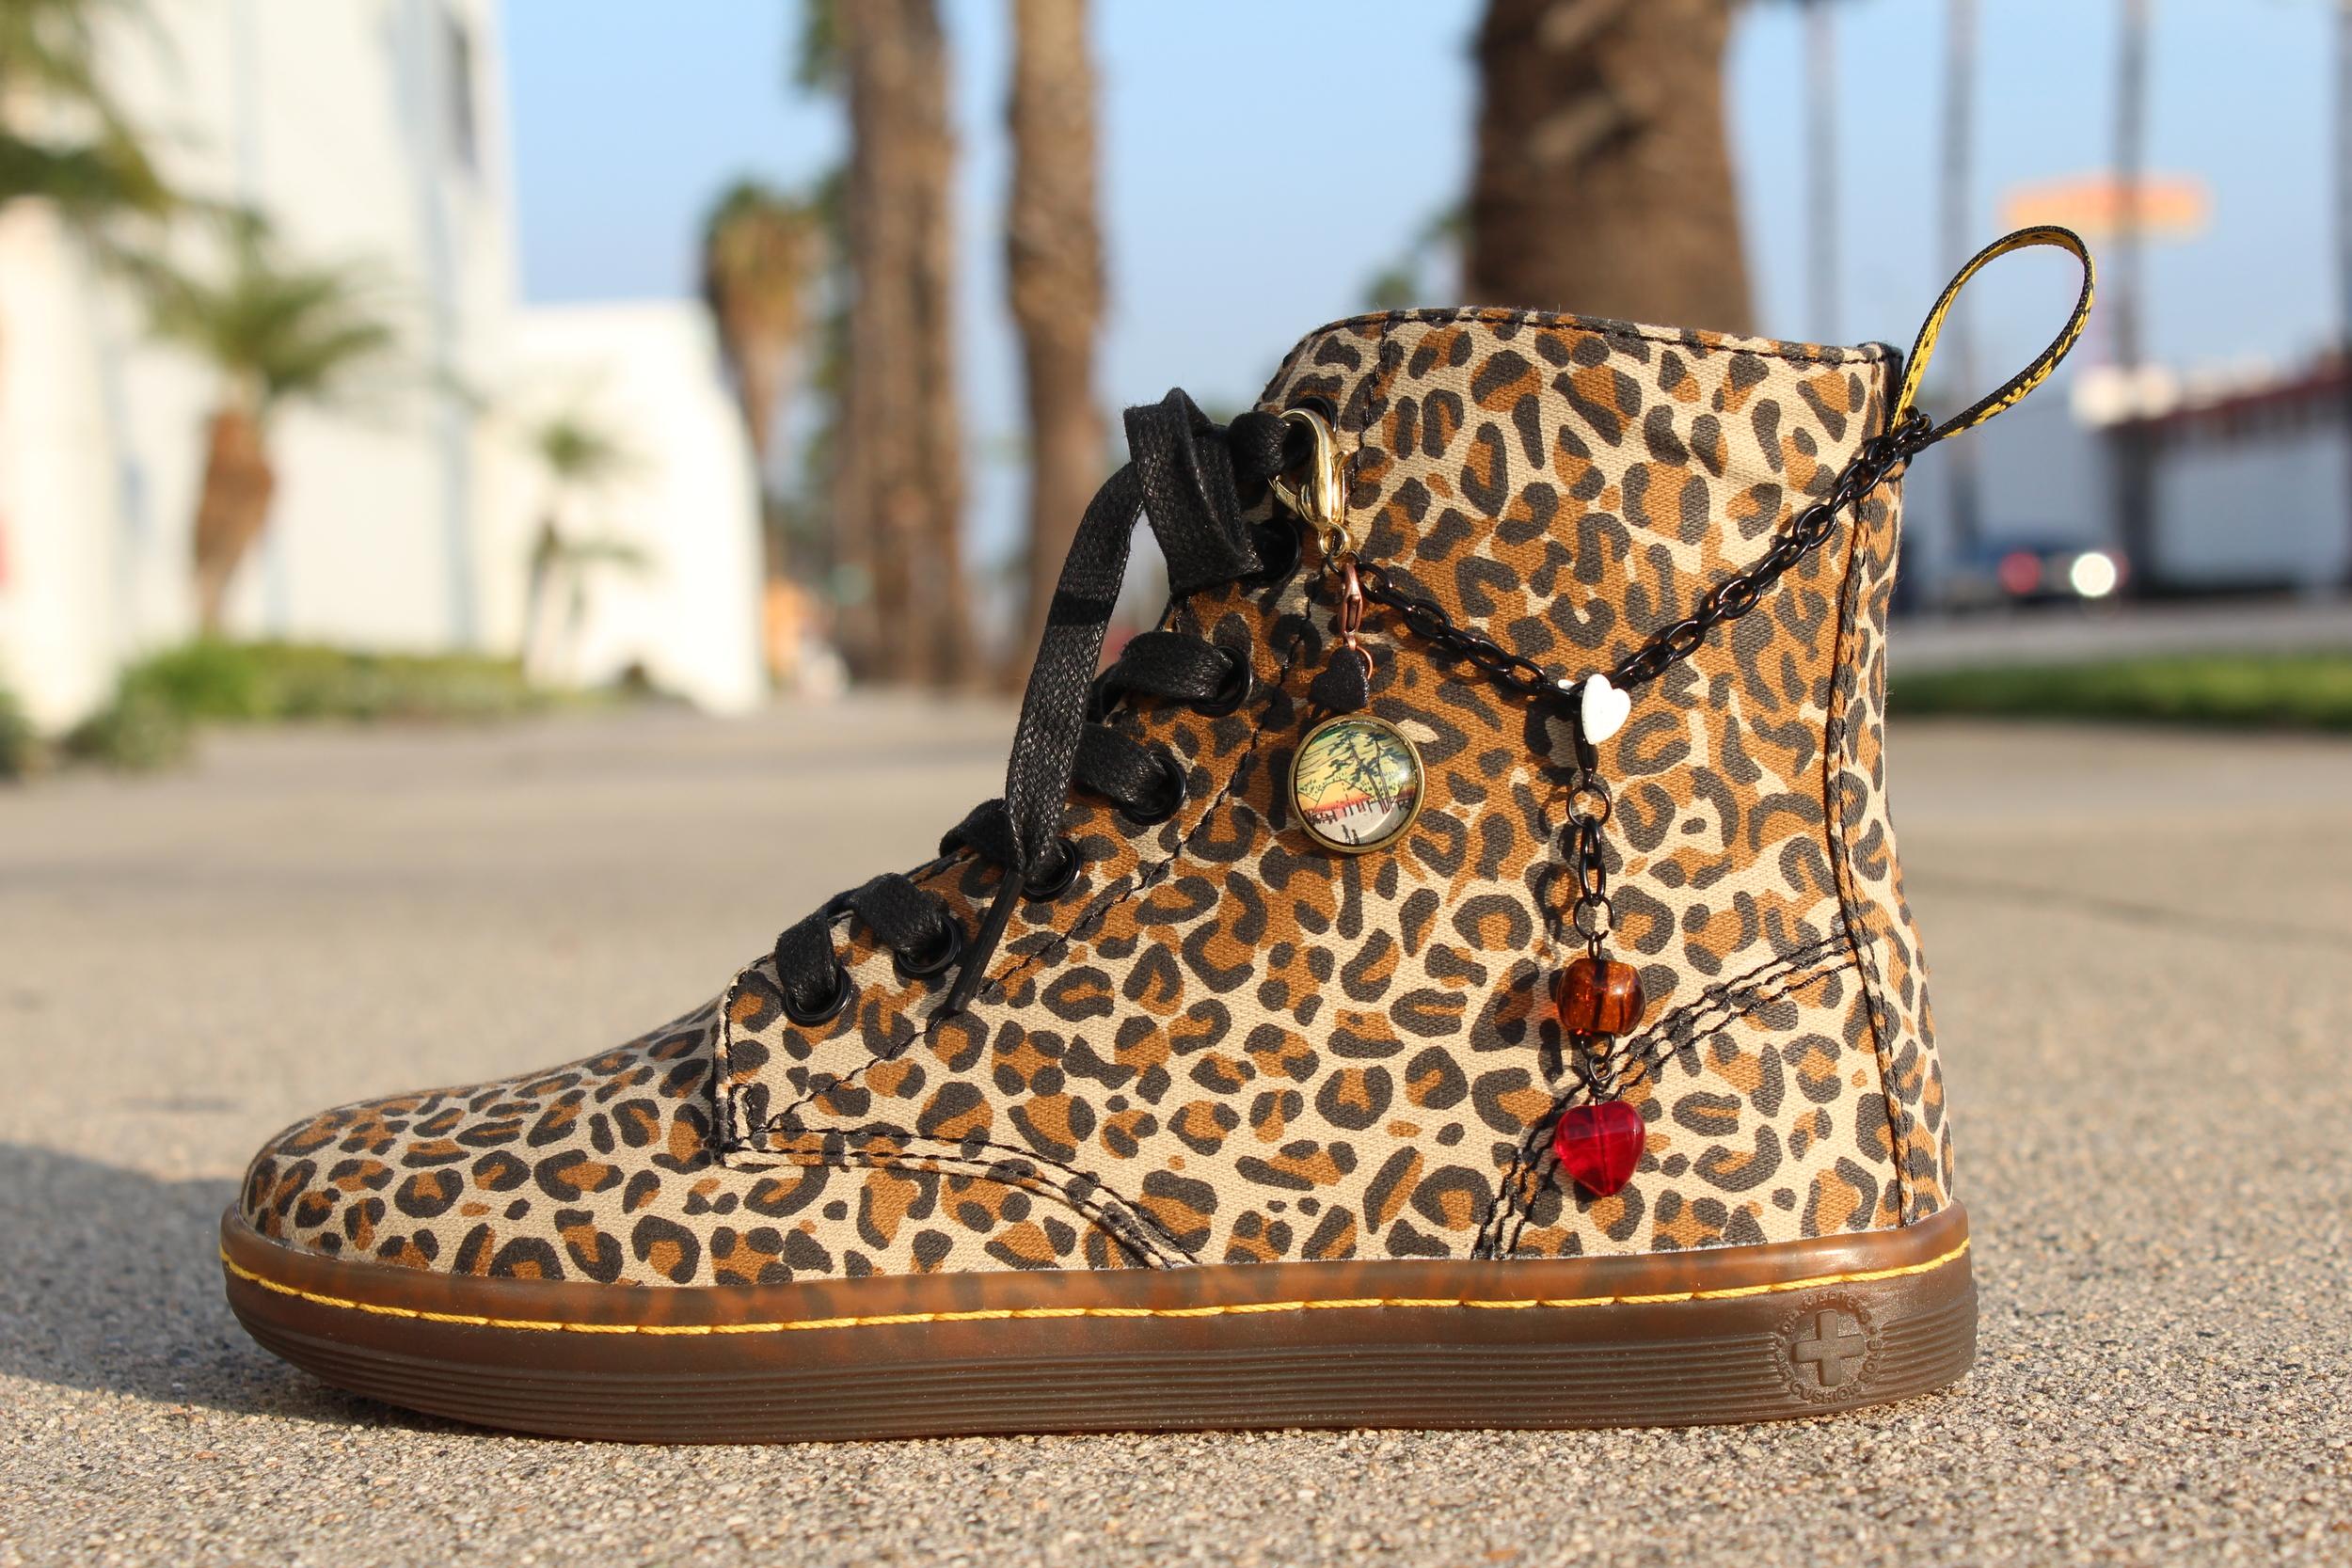 leopard charm.JPG